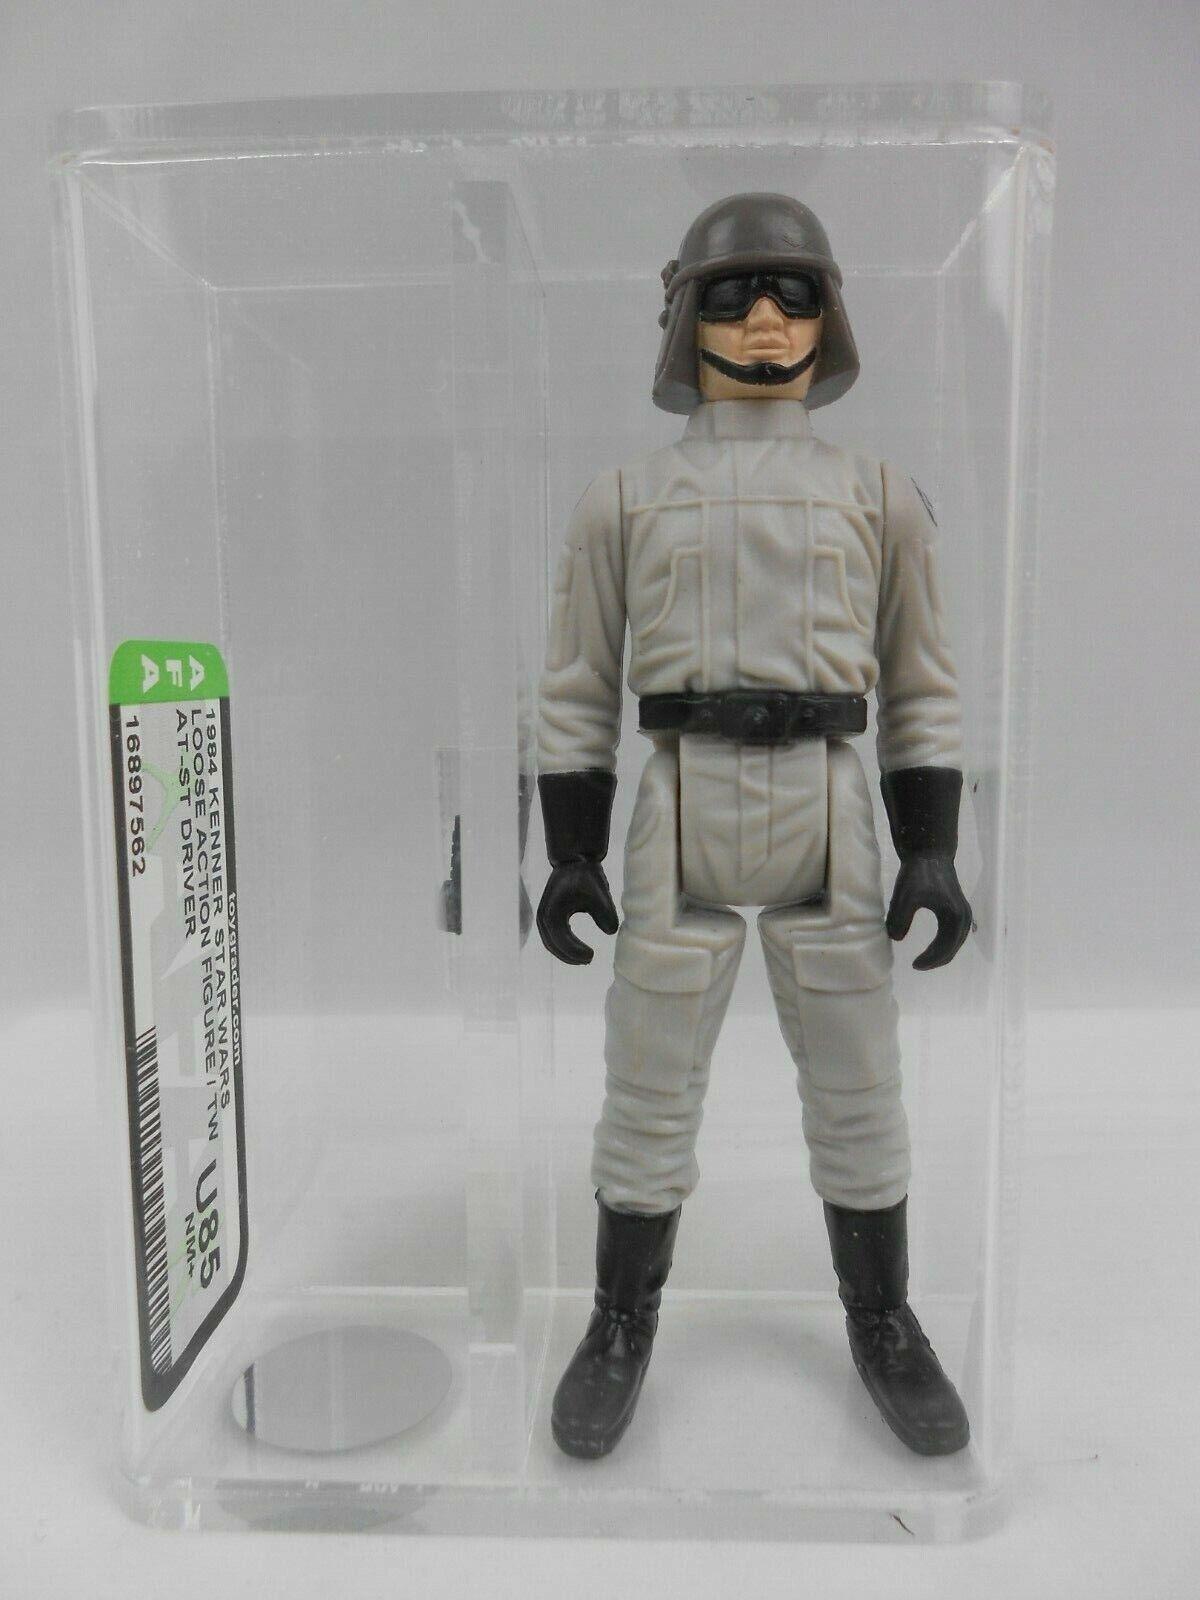 Vintage Star Wars ROTJ 1984 AT-ST Driver - AFA Grade U85 (NM+) - COO TW - Kenner